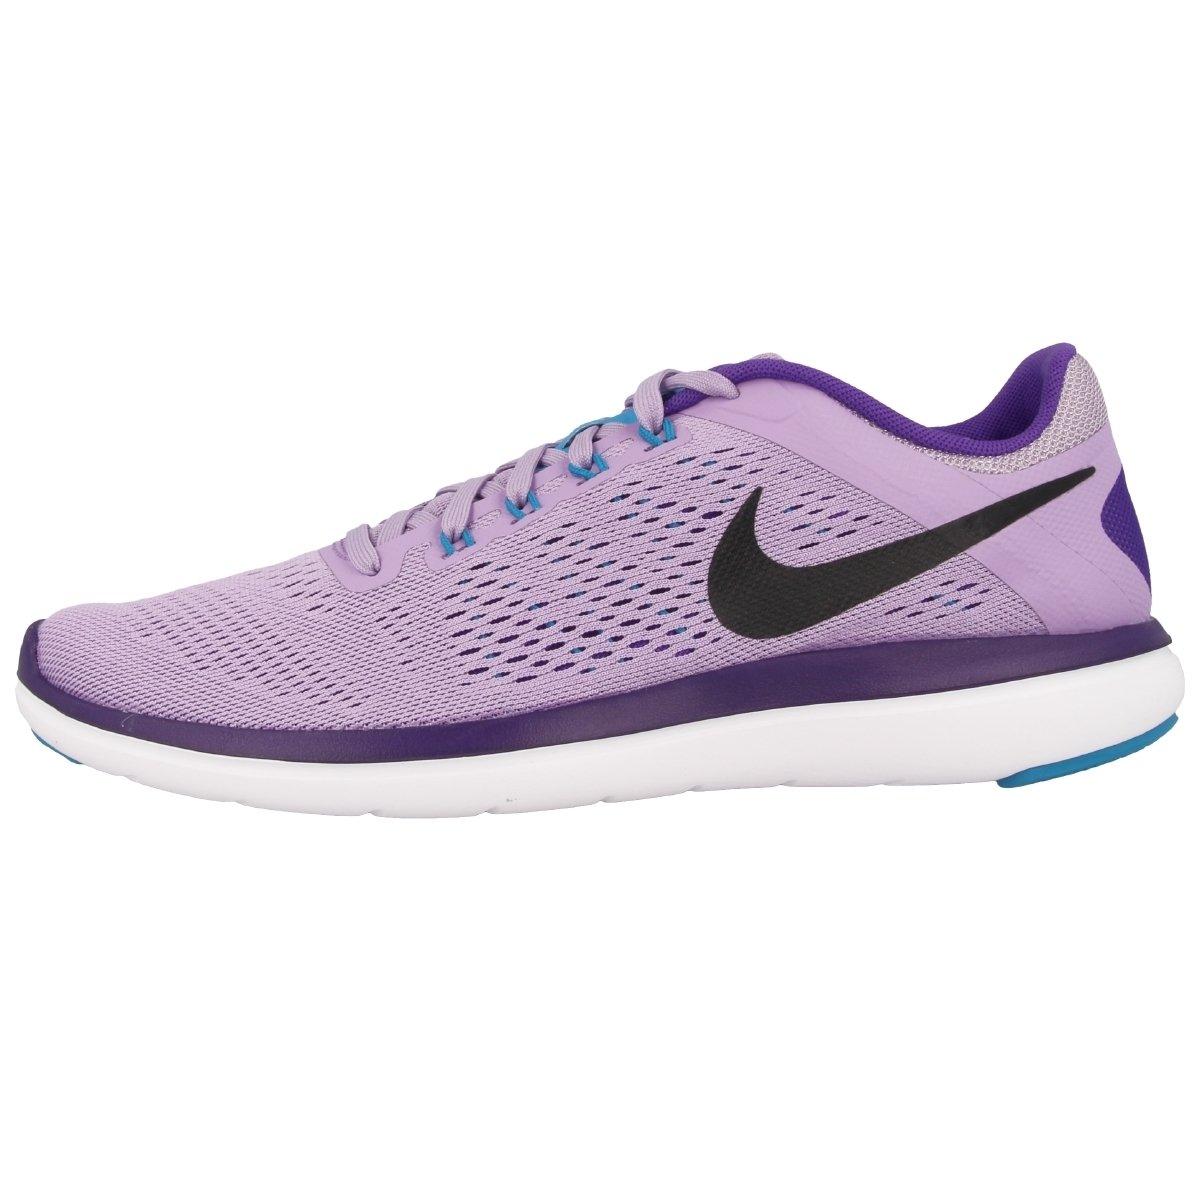 NIKE Women's Flex 2016 Rn Running Shoes B01CJ2QQL8 10.5 B(M) US Urban Lilac/Black/Fierce Purple/White